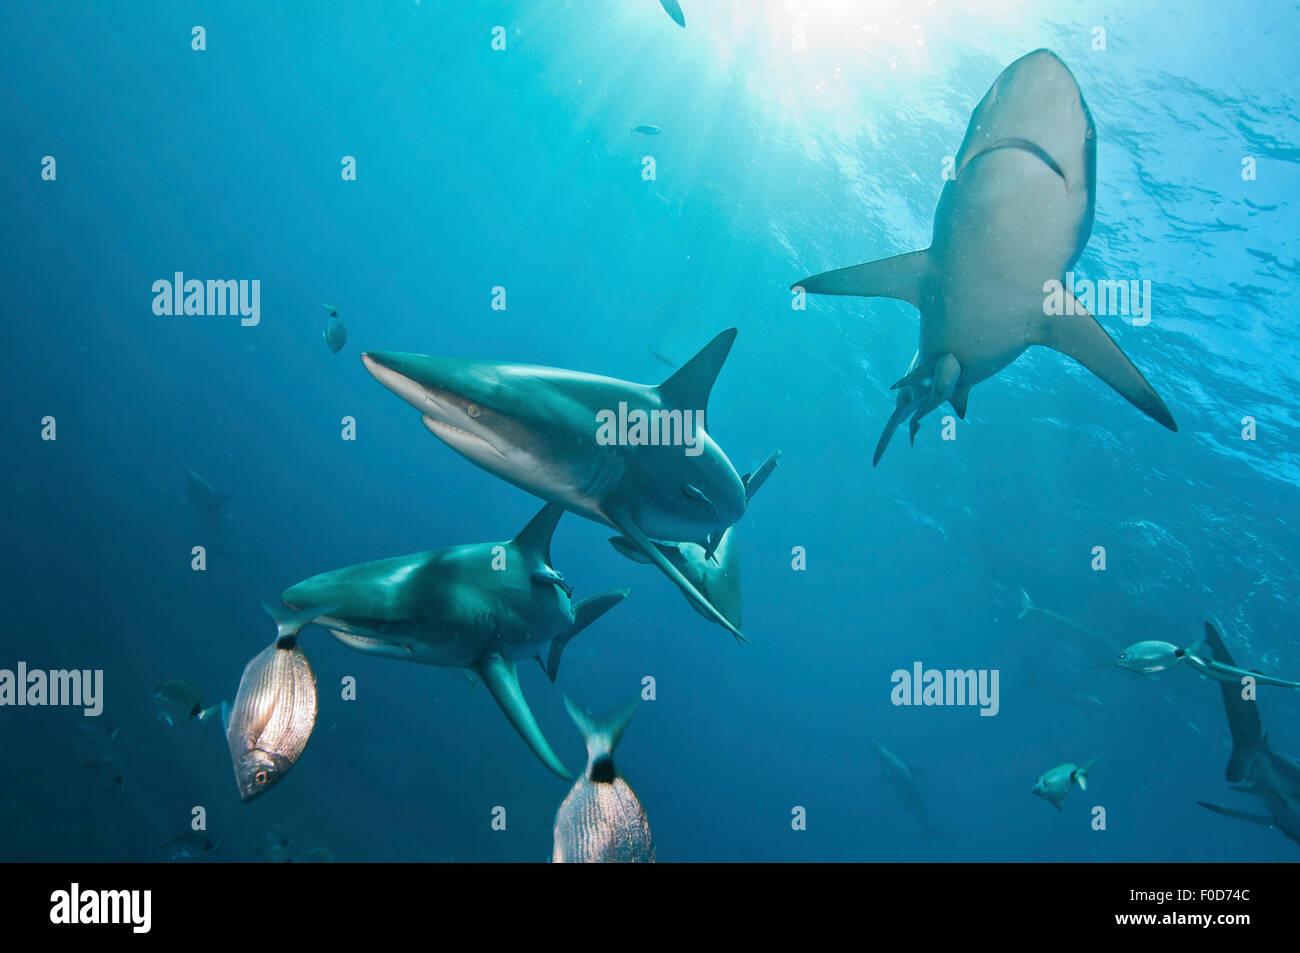 Several oceanic blacktip sharks swim by near the surface against sunrays, Aliwal Shoal, Umkomaas, KwaZulu-Natal, Stock Photo